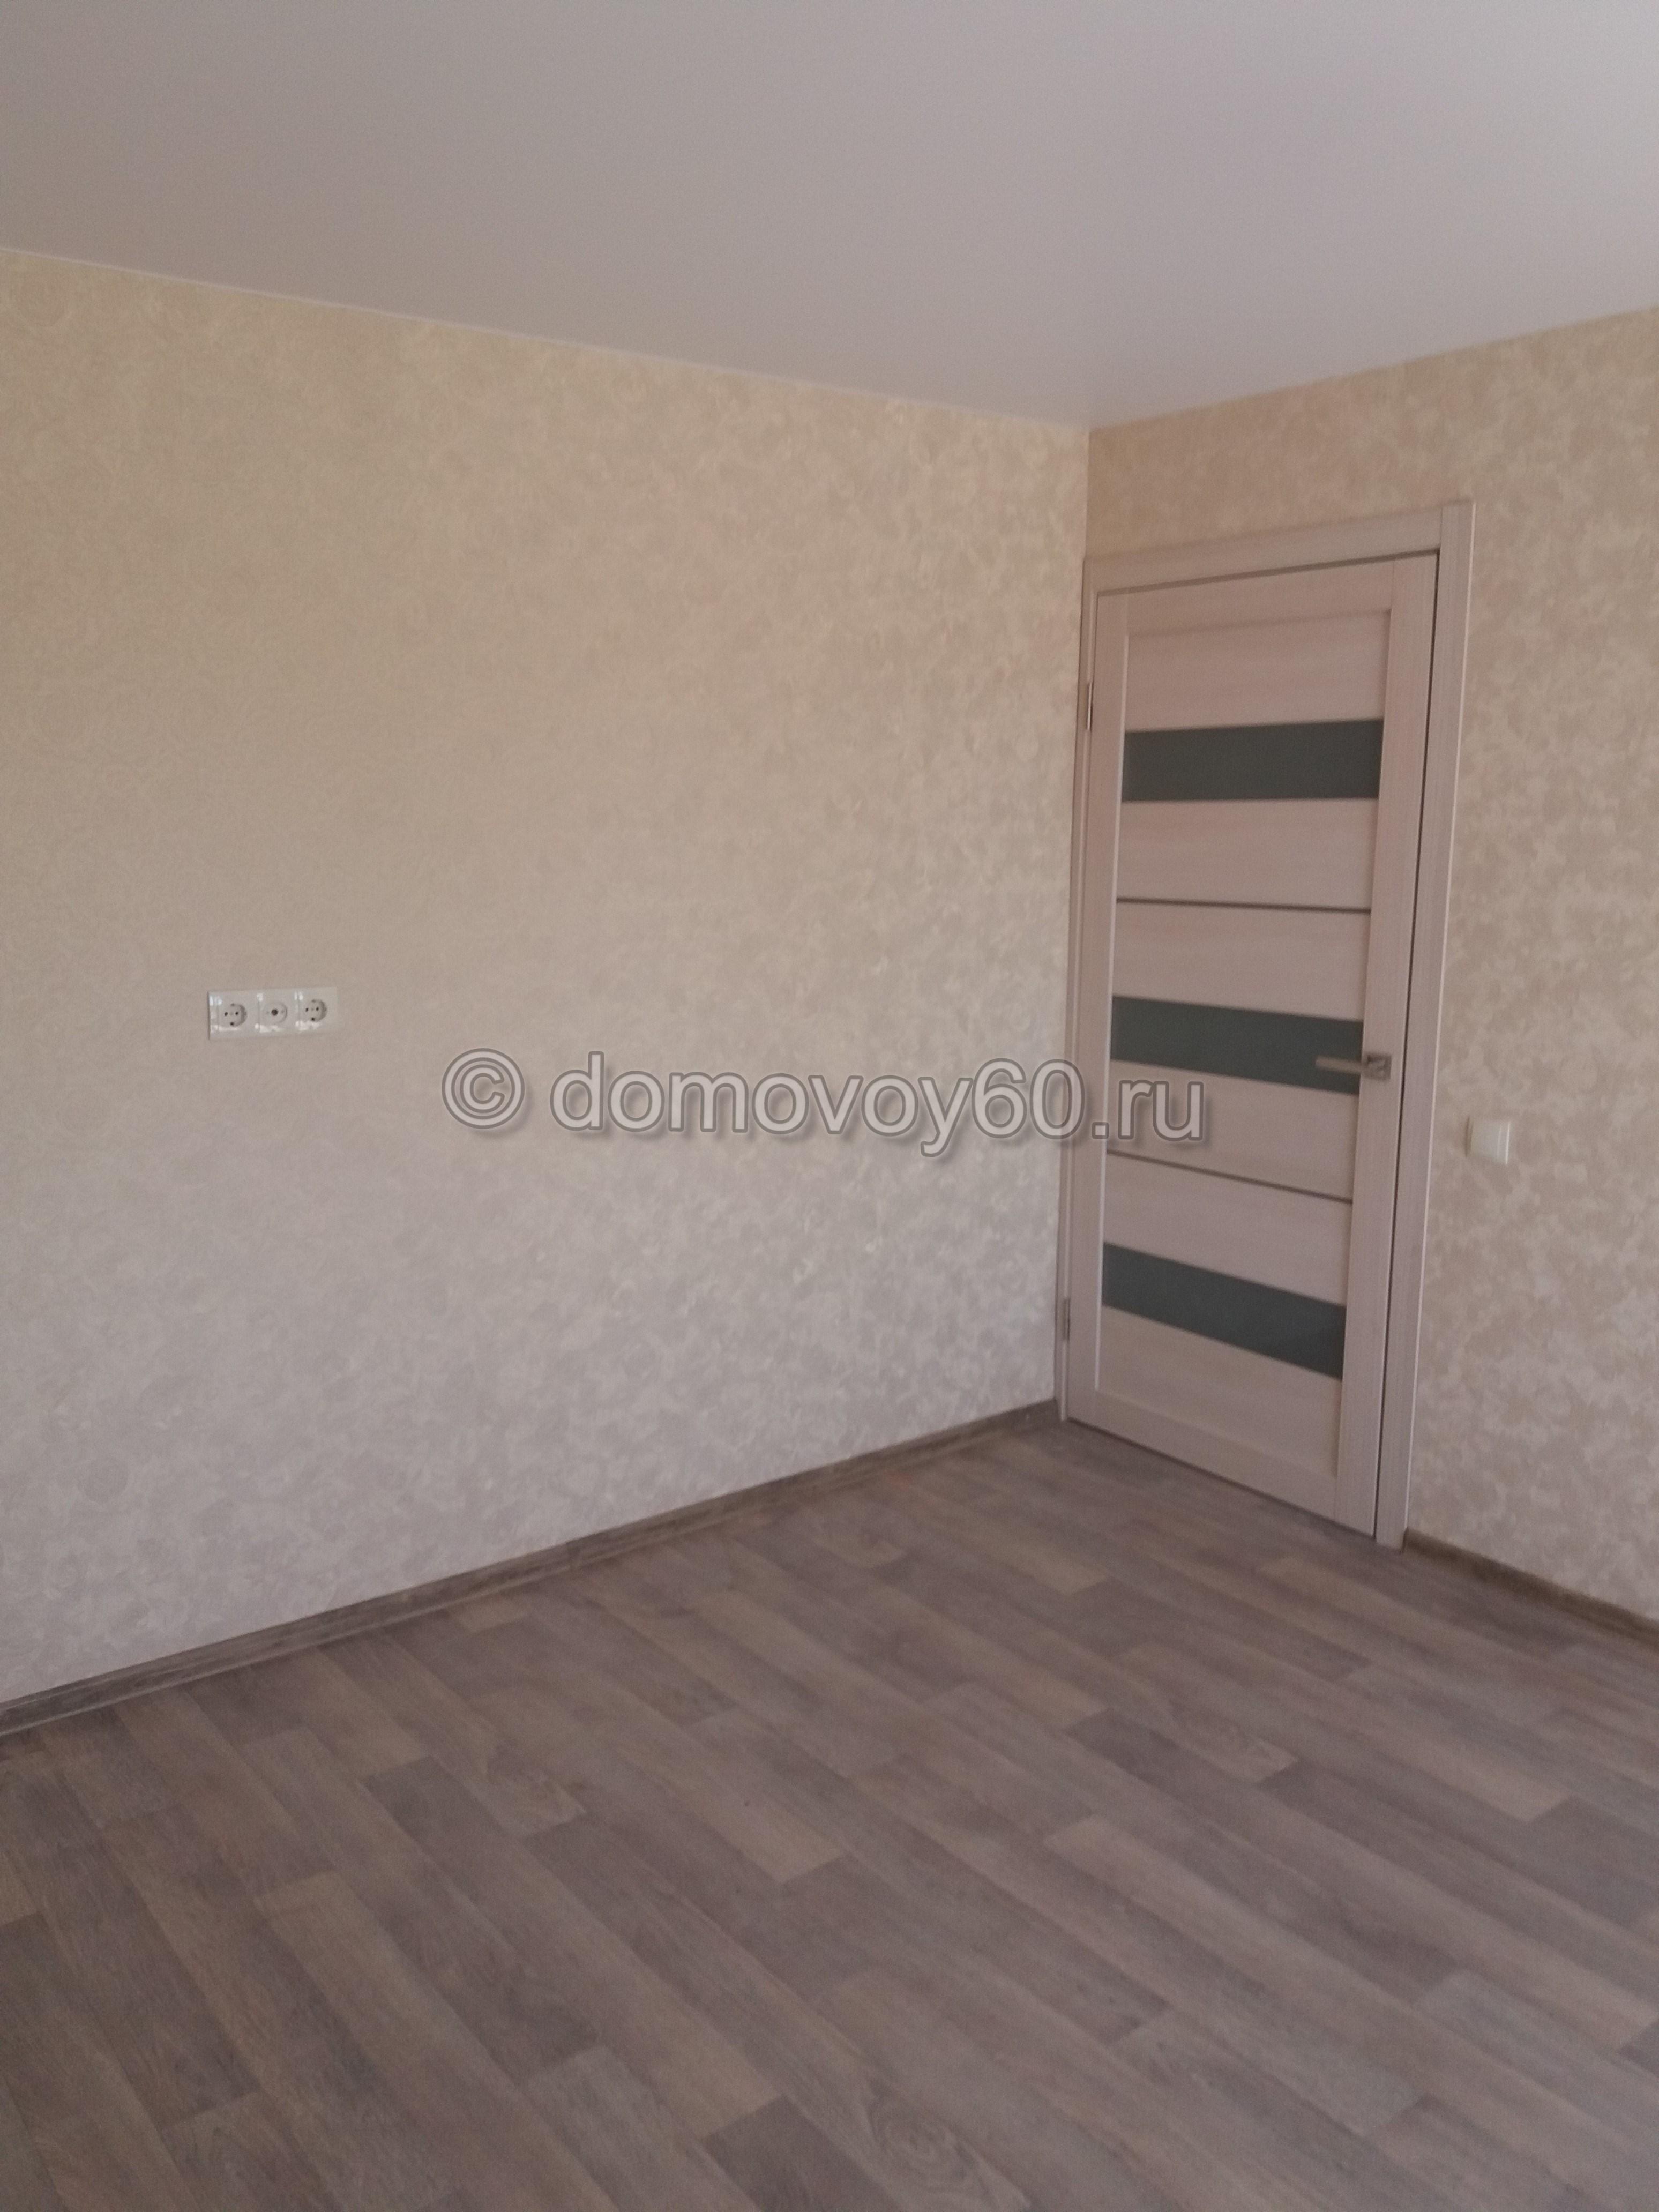 domovoy60-015